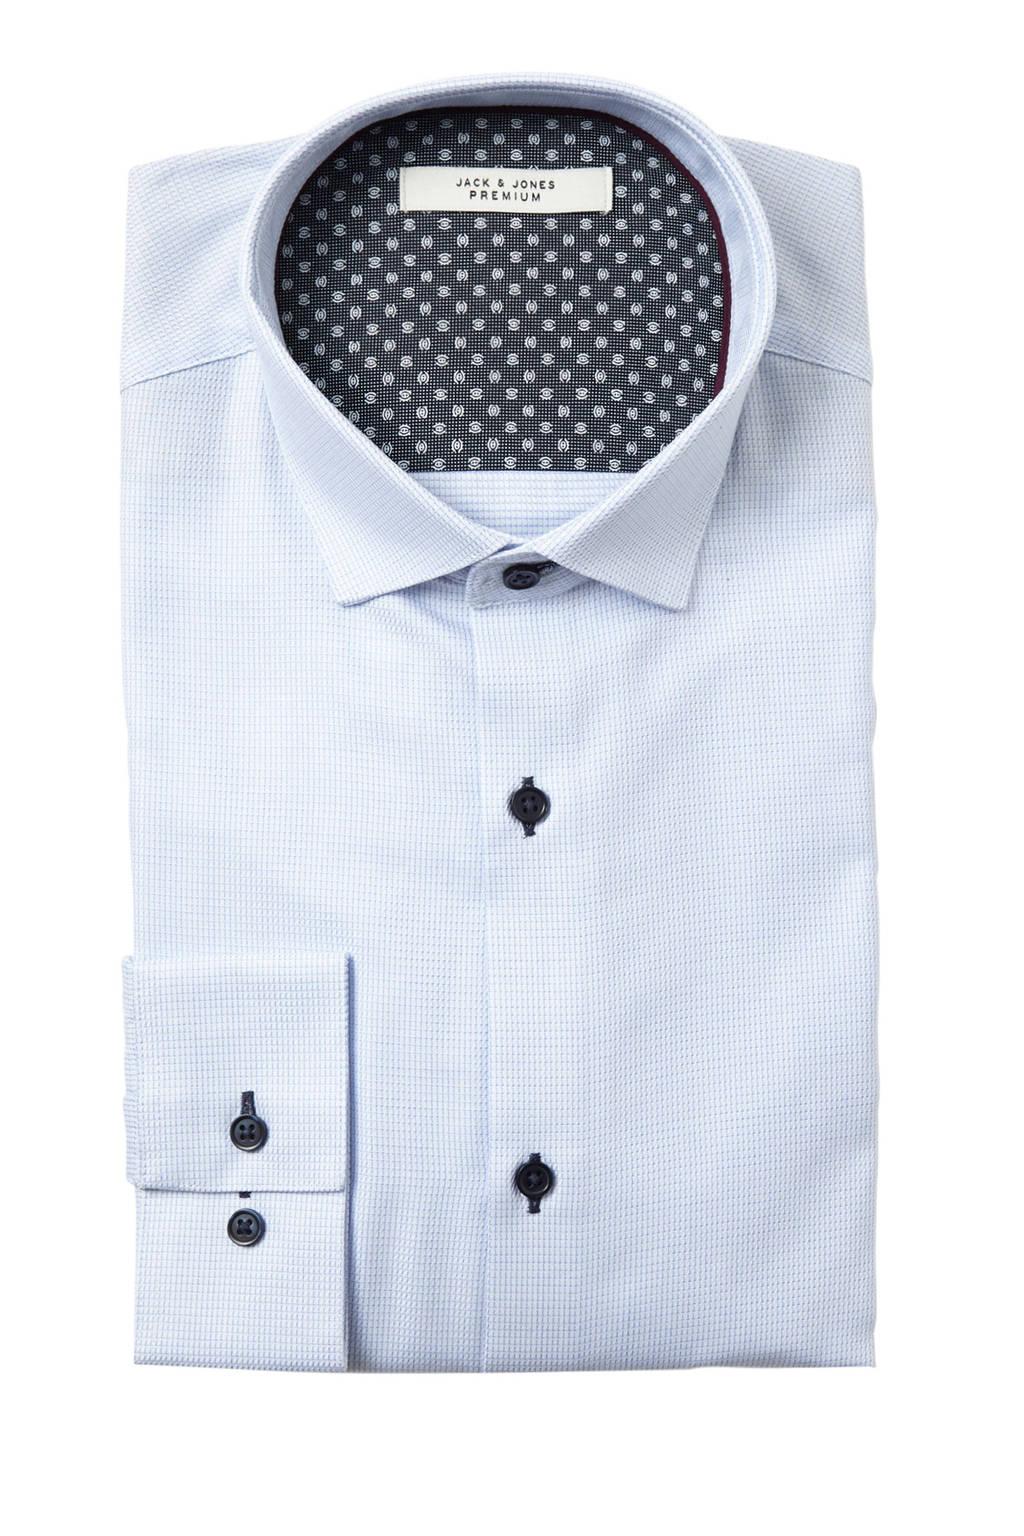 Jack & Jones Premium slim fit overhemd Adrian wit, Wit